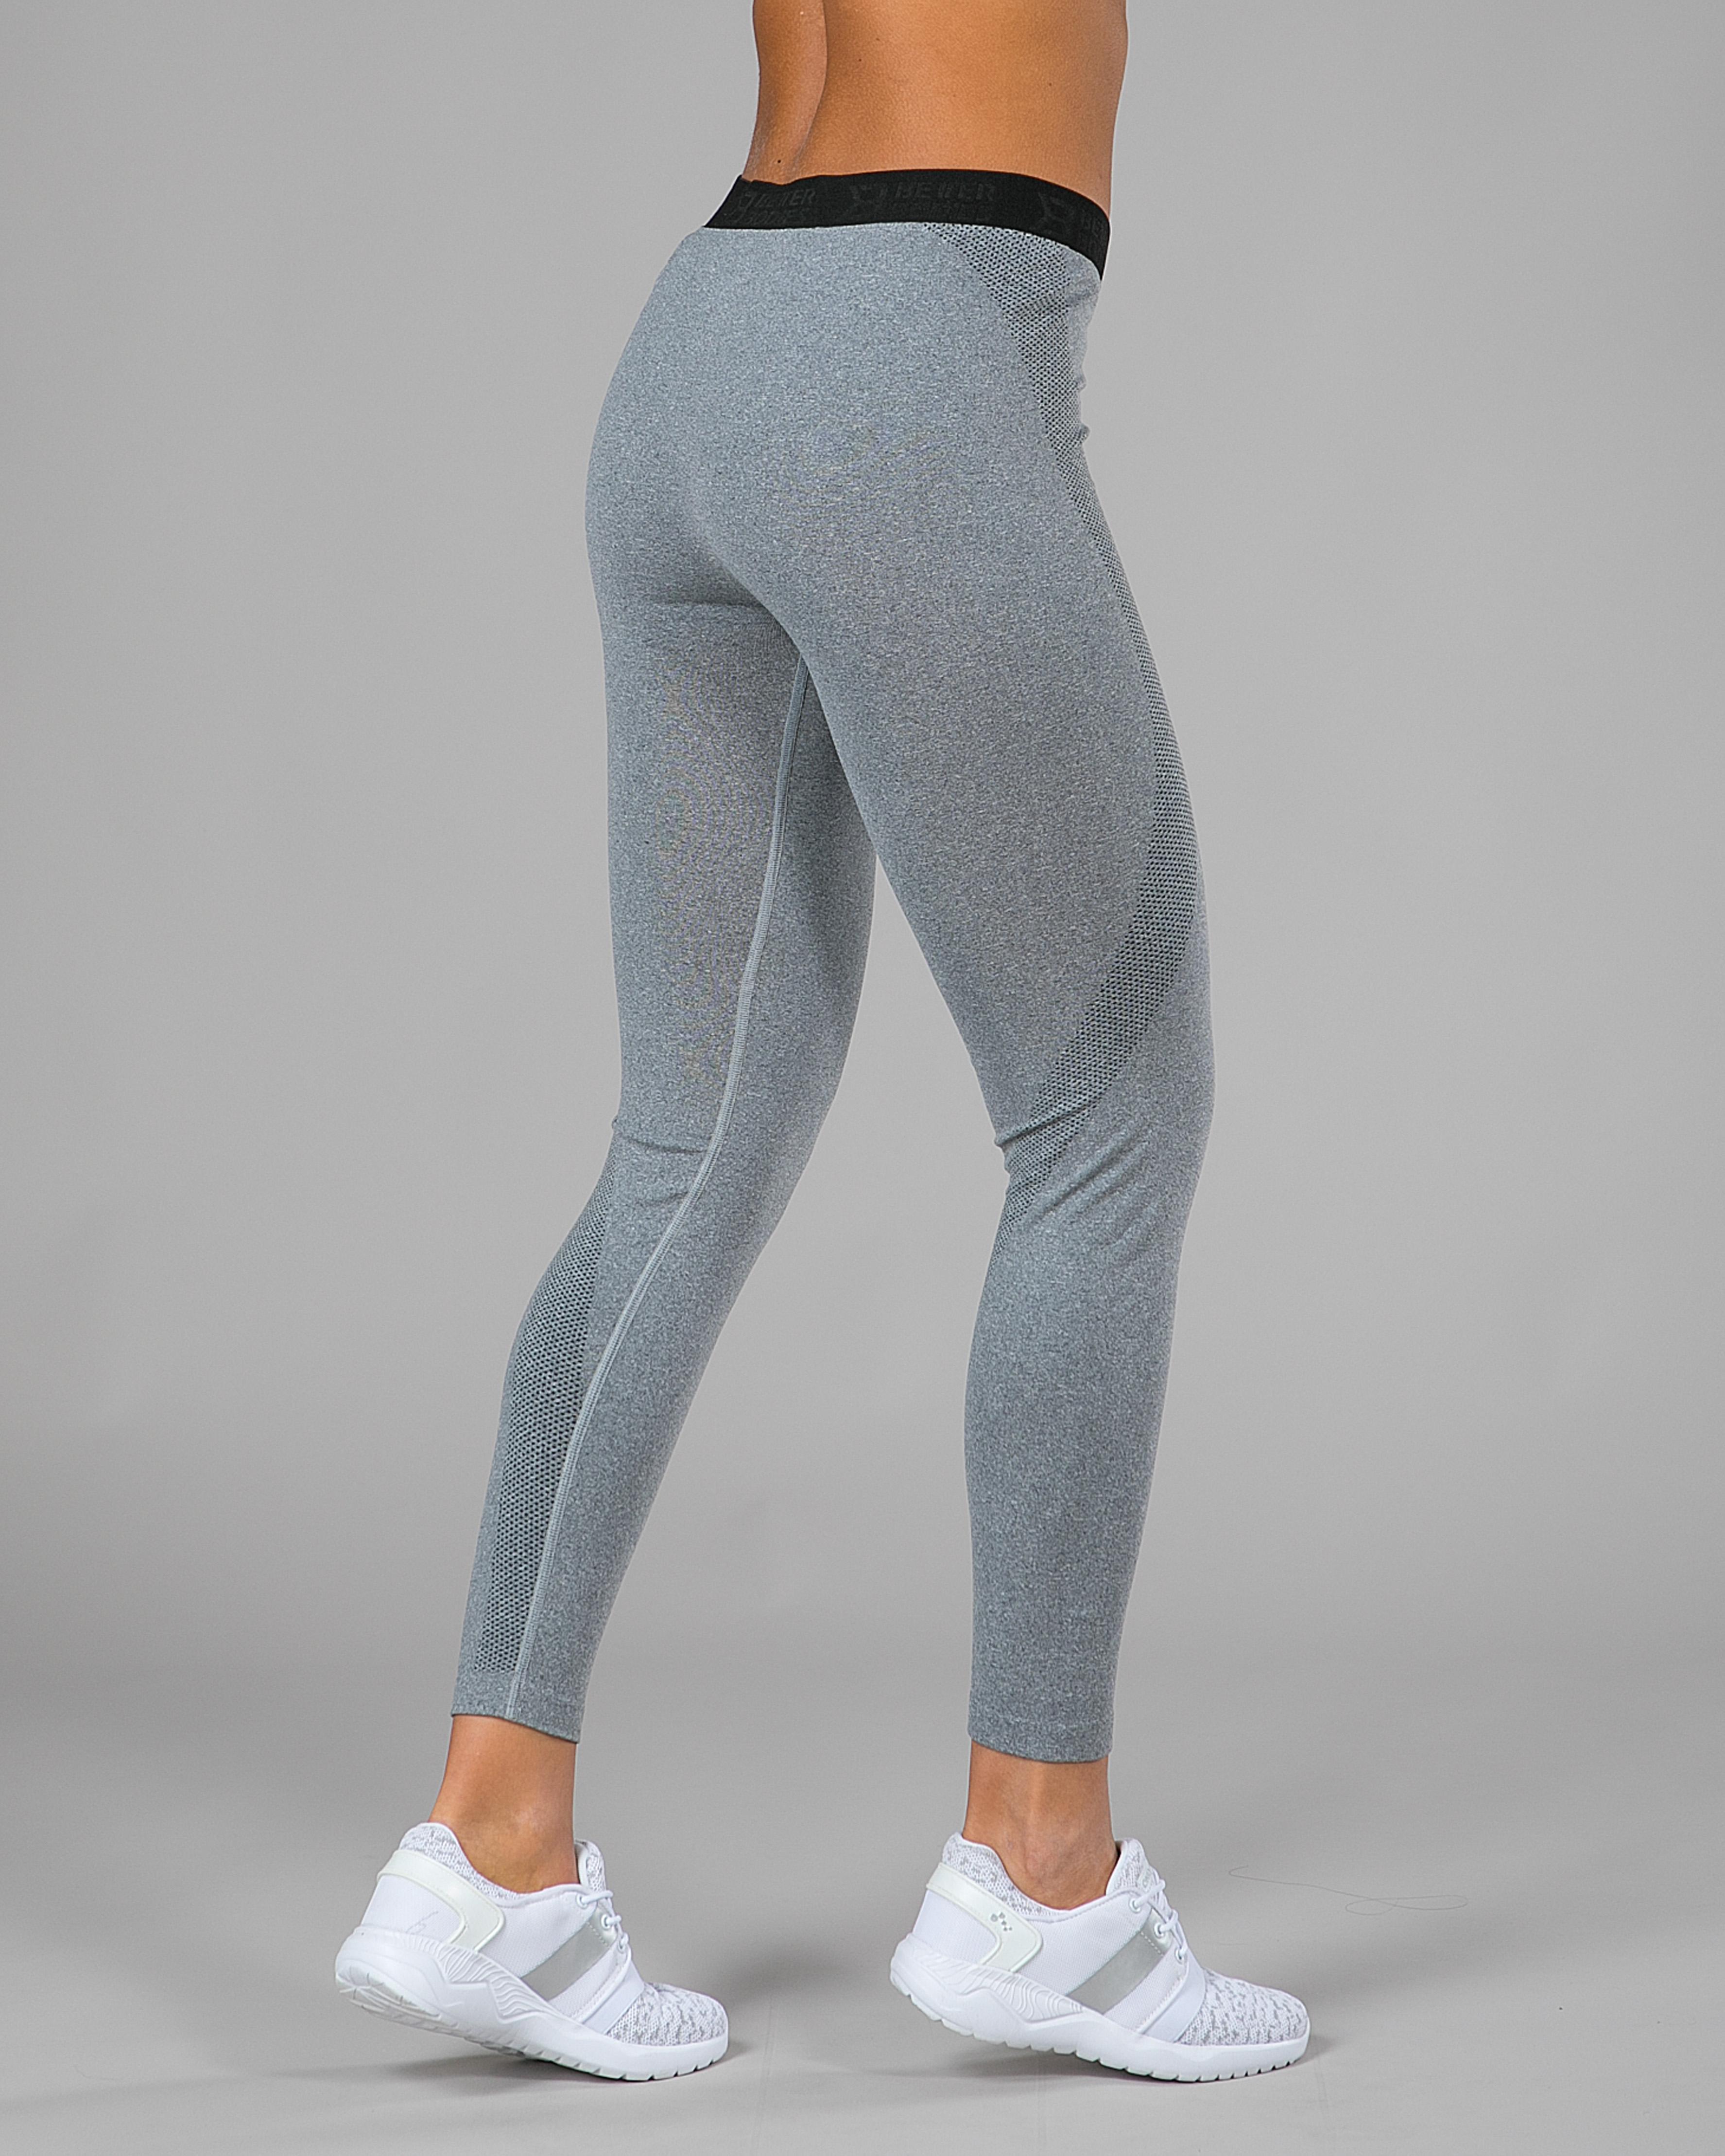 Better Bodies Astoria Curve Tights Greymelange Tights.no